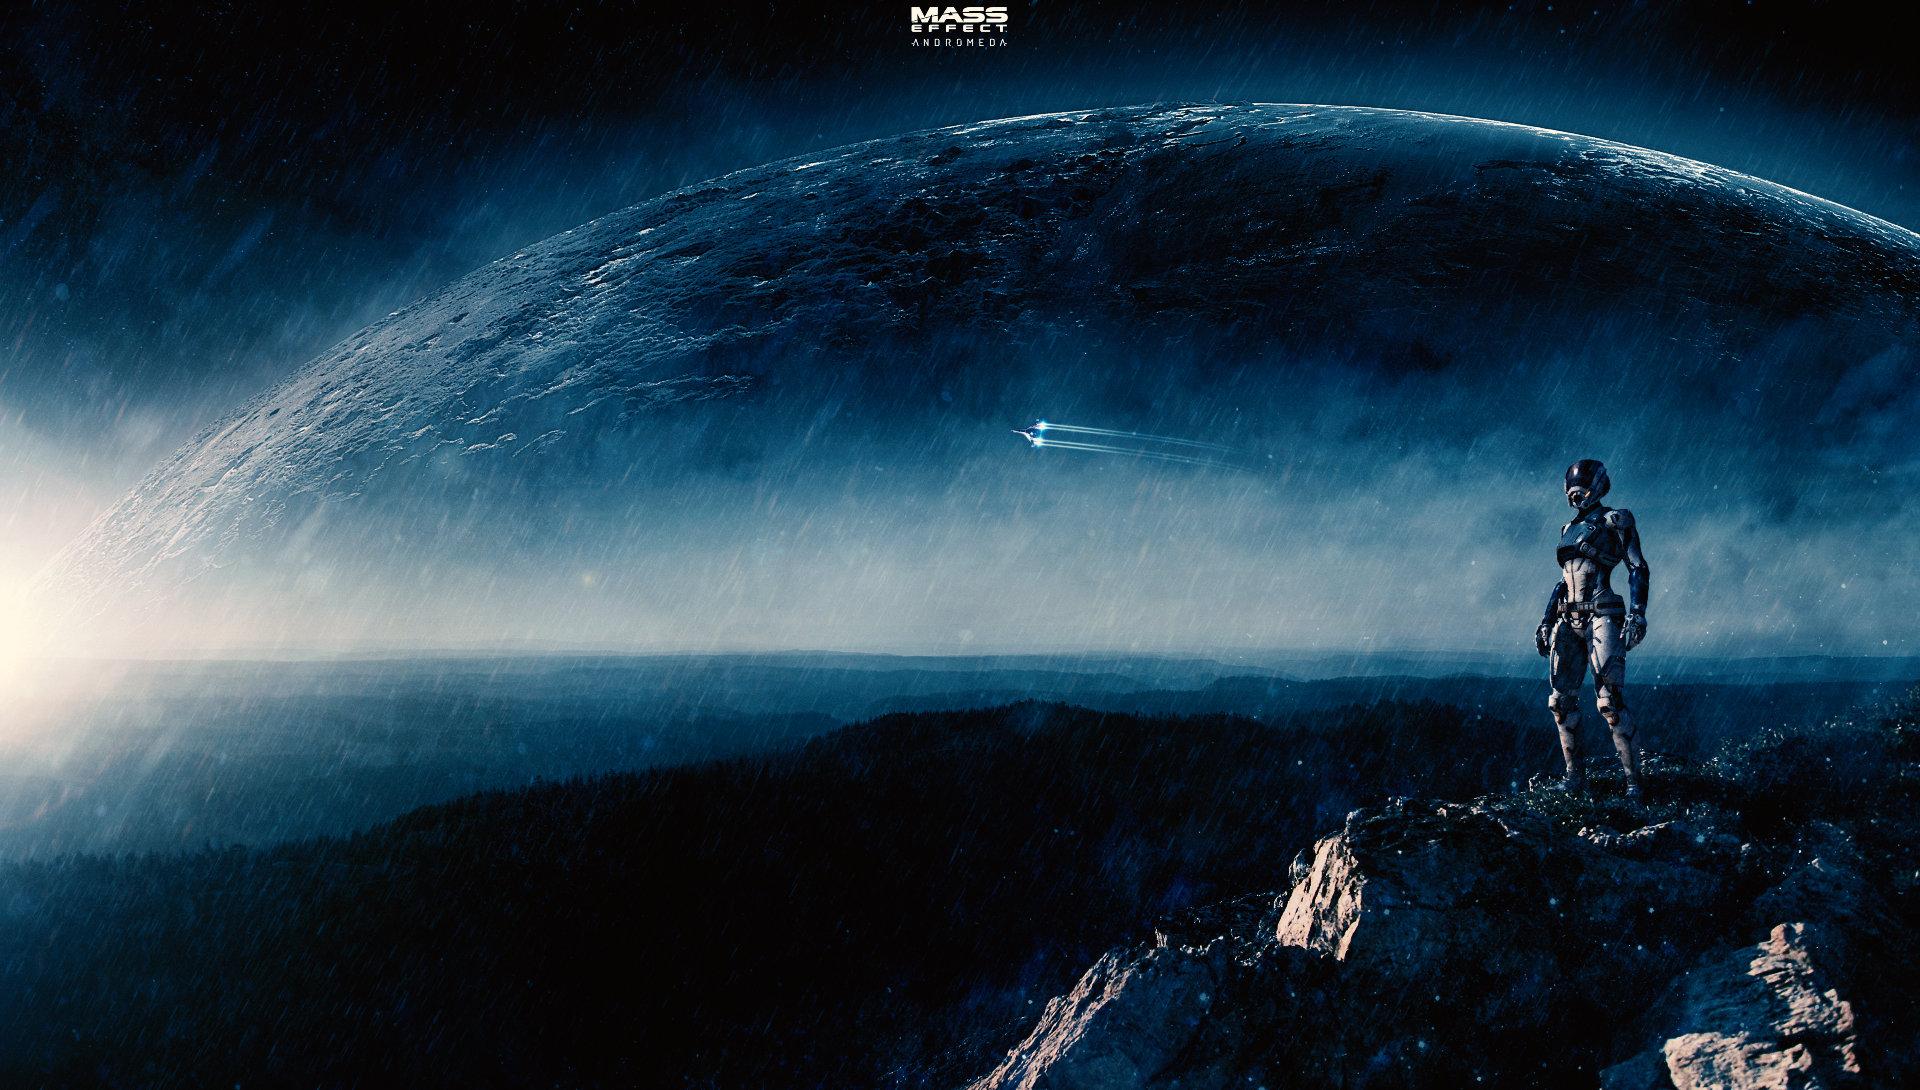 Mantengase Atento Que Ira Creciendo Best Mass Effect Andromeda